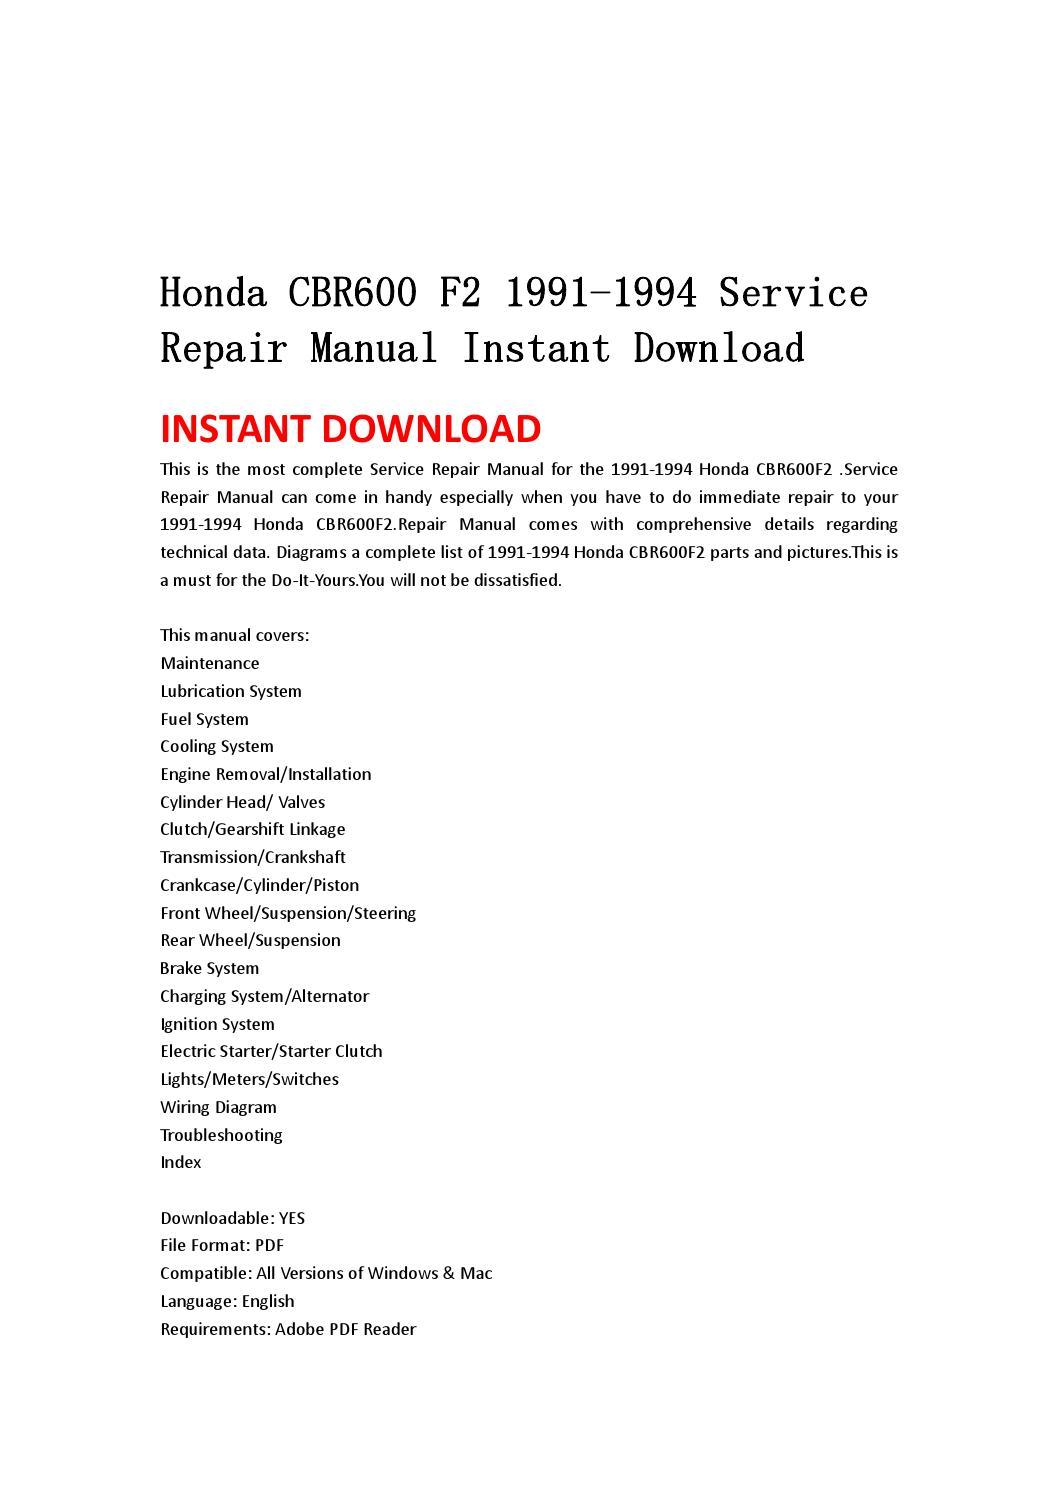 Honda Cbr600 F2 1991 1994 Service Repair Manual Instant